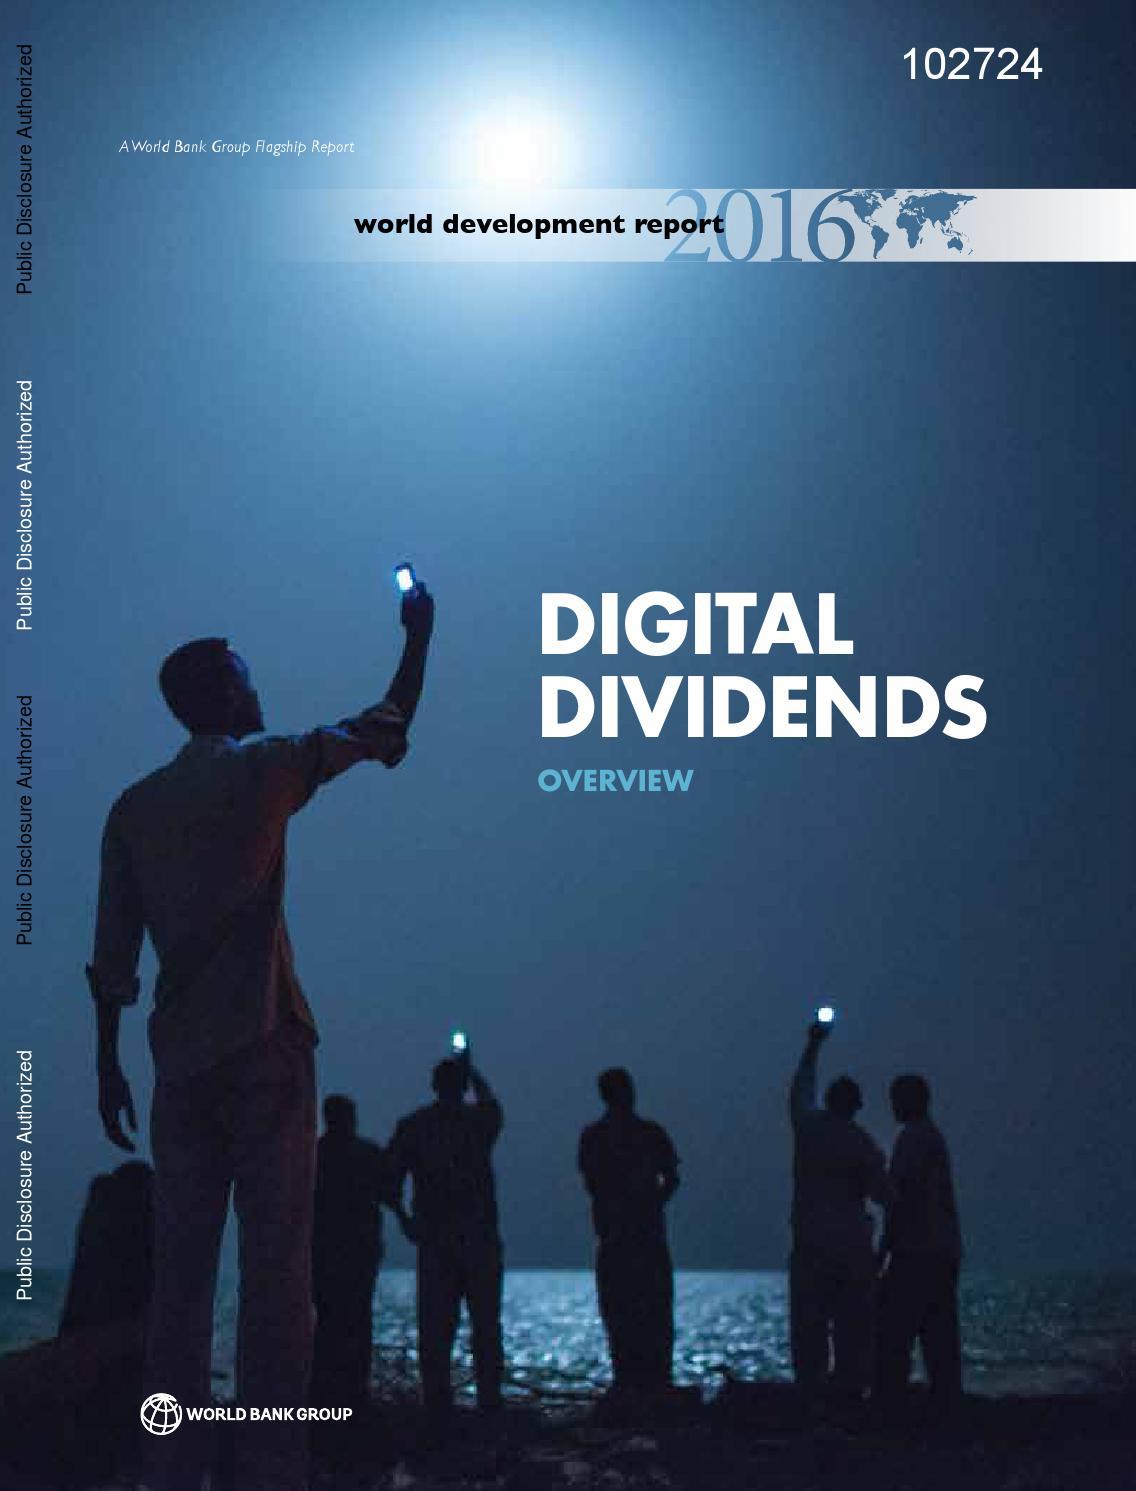 World development report 2016 digital dividends by gant publish world development report 2016 digital dividends by gant publish issuu fandeluxe Choice Image